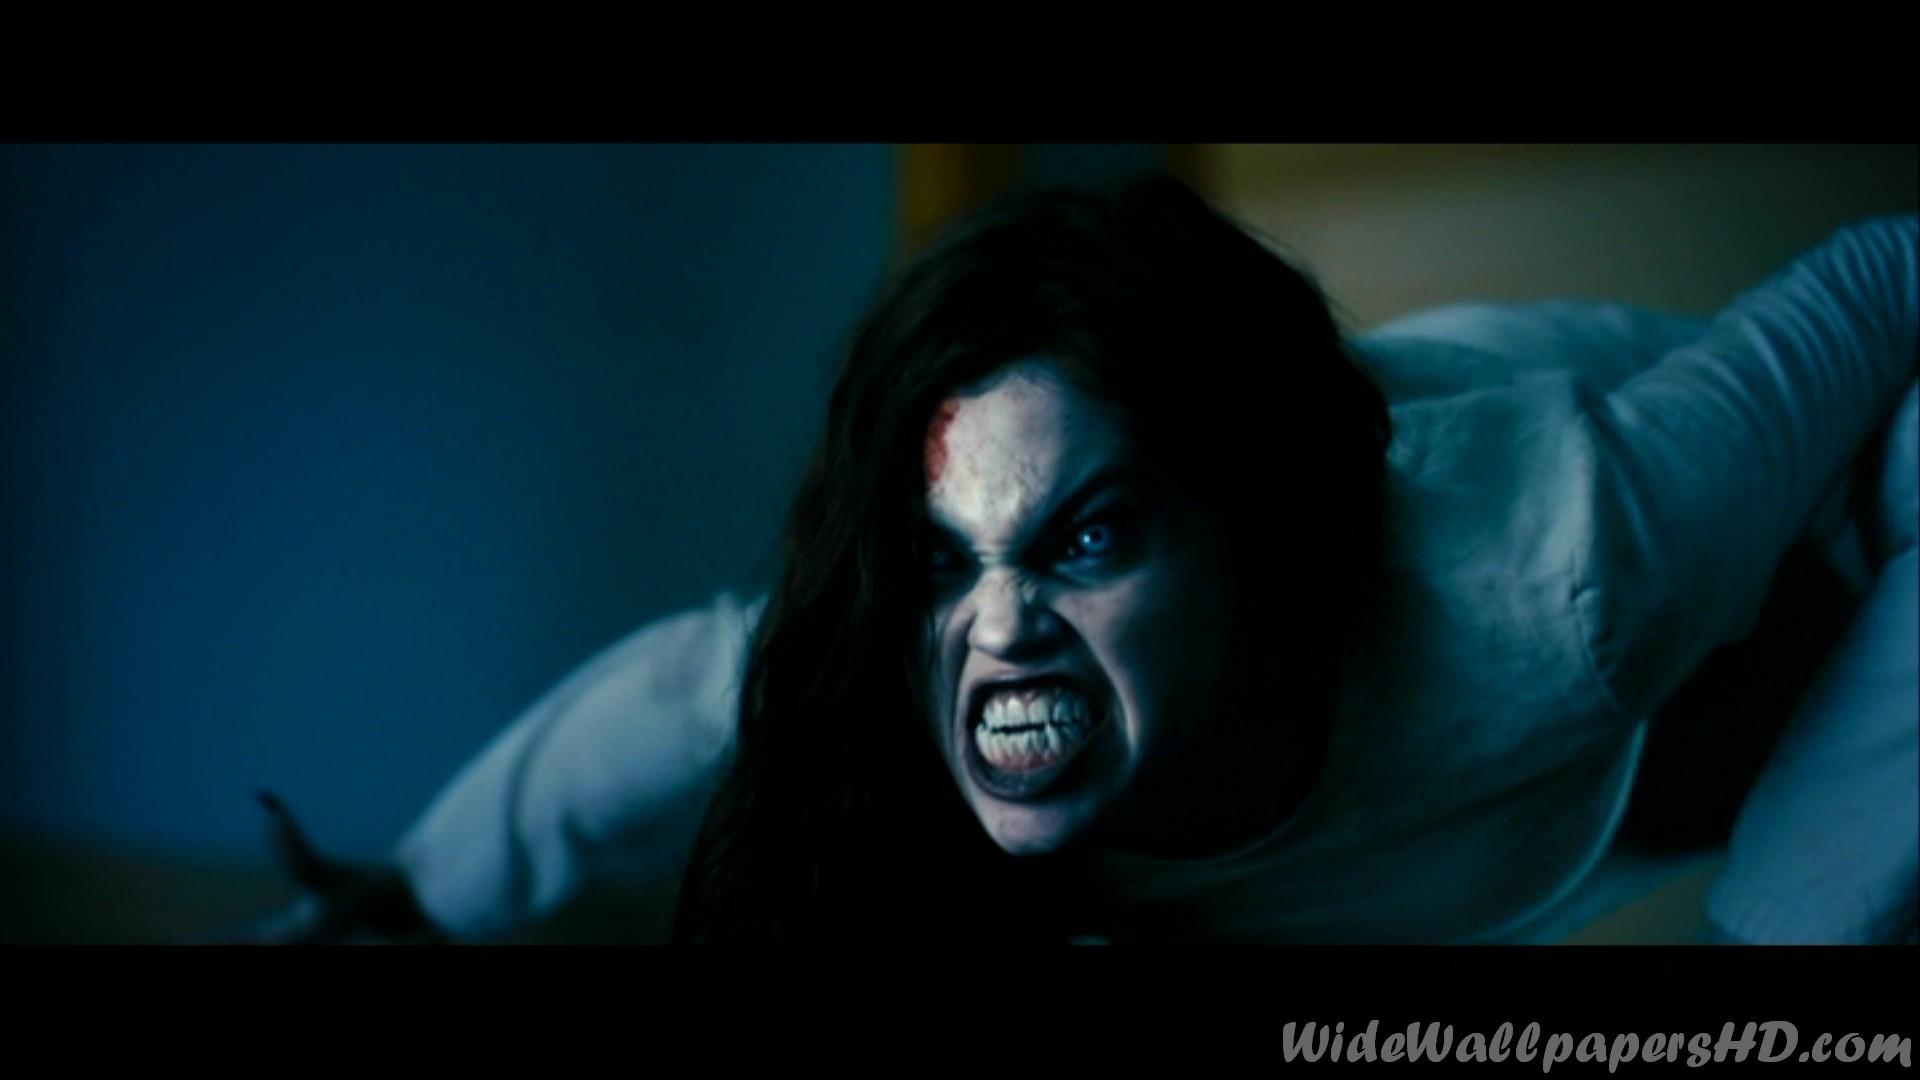 Images for Gt Vampire Wallpaper Hd